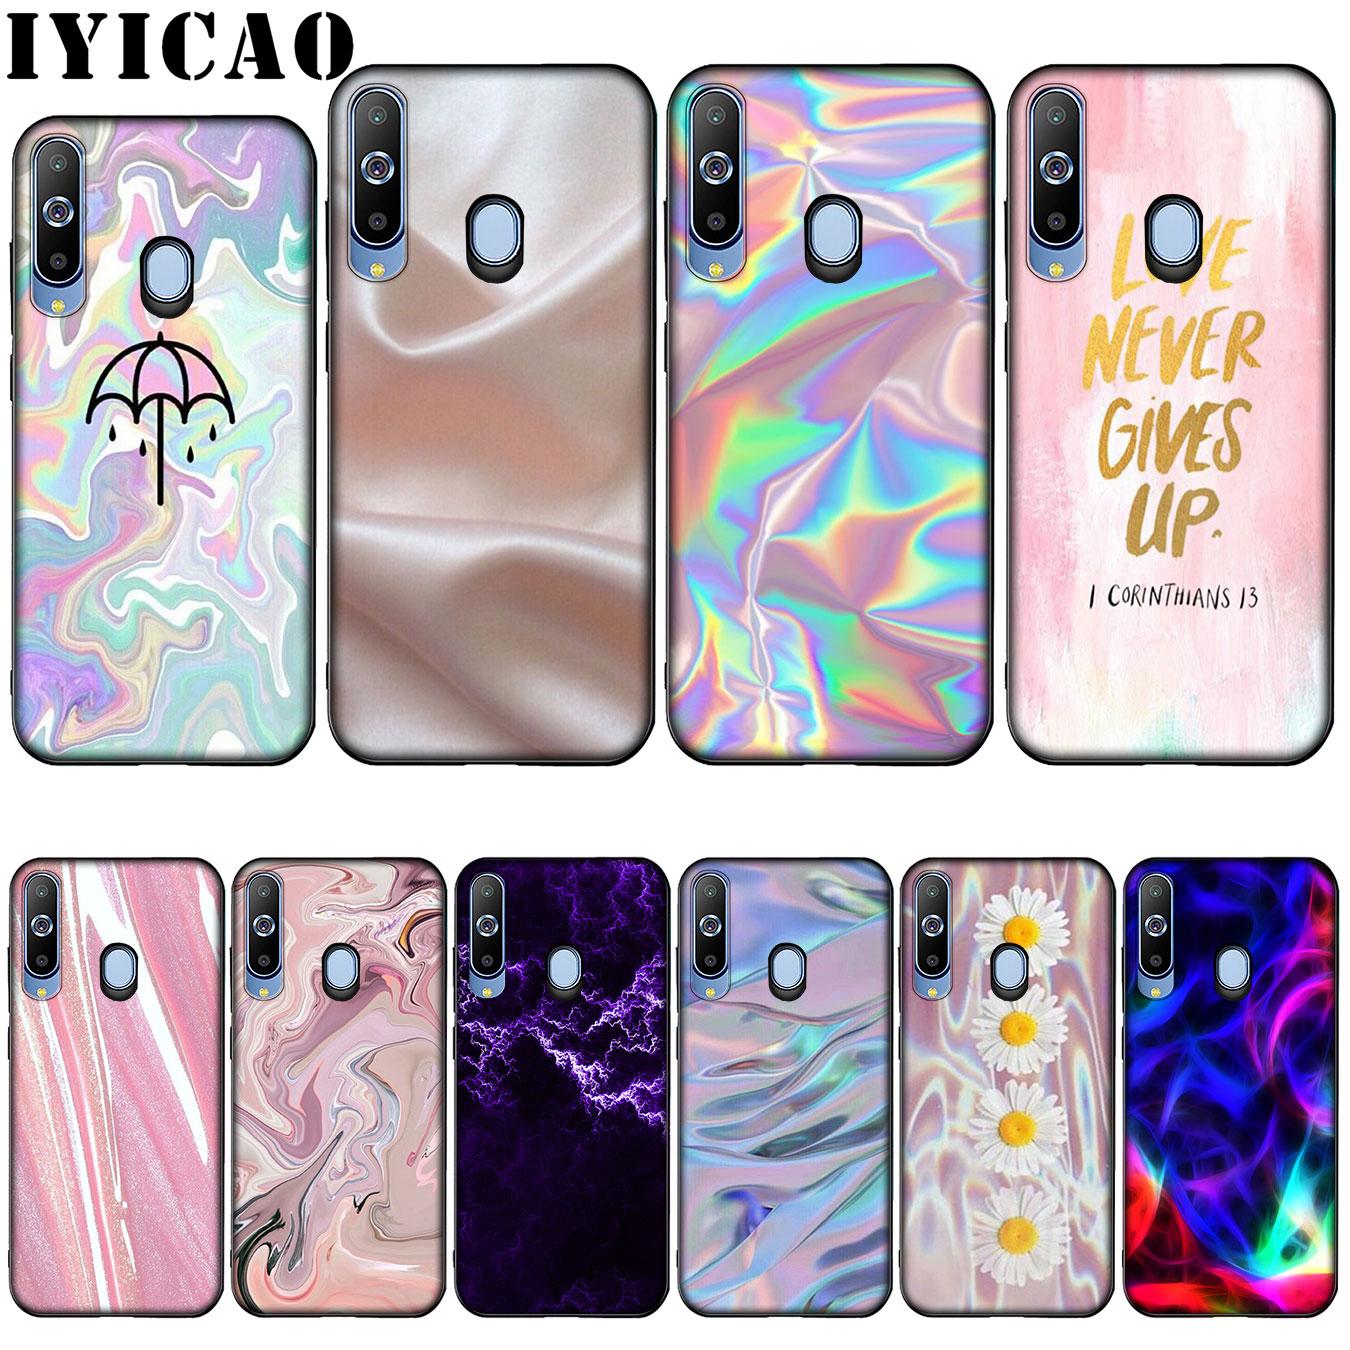 Funda IYICAO Pastel metálico Tumblr bonita silicona suave funda para  Samsung Galaxy A10 A30 A40 A50 A70 M10 M20 M30|Fundas ajustadas| -  AliExpress